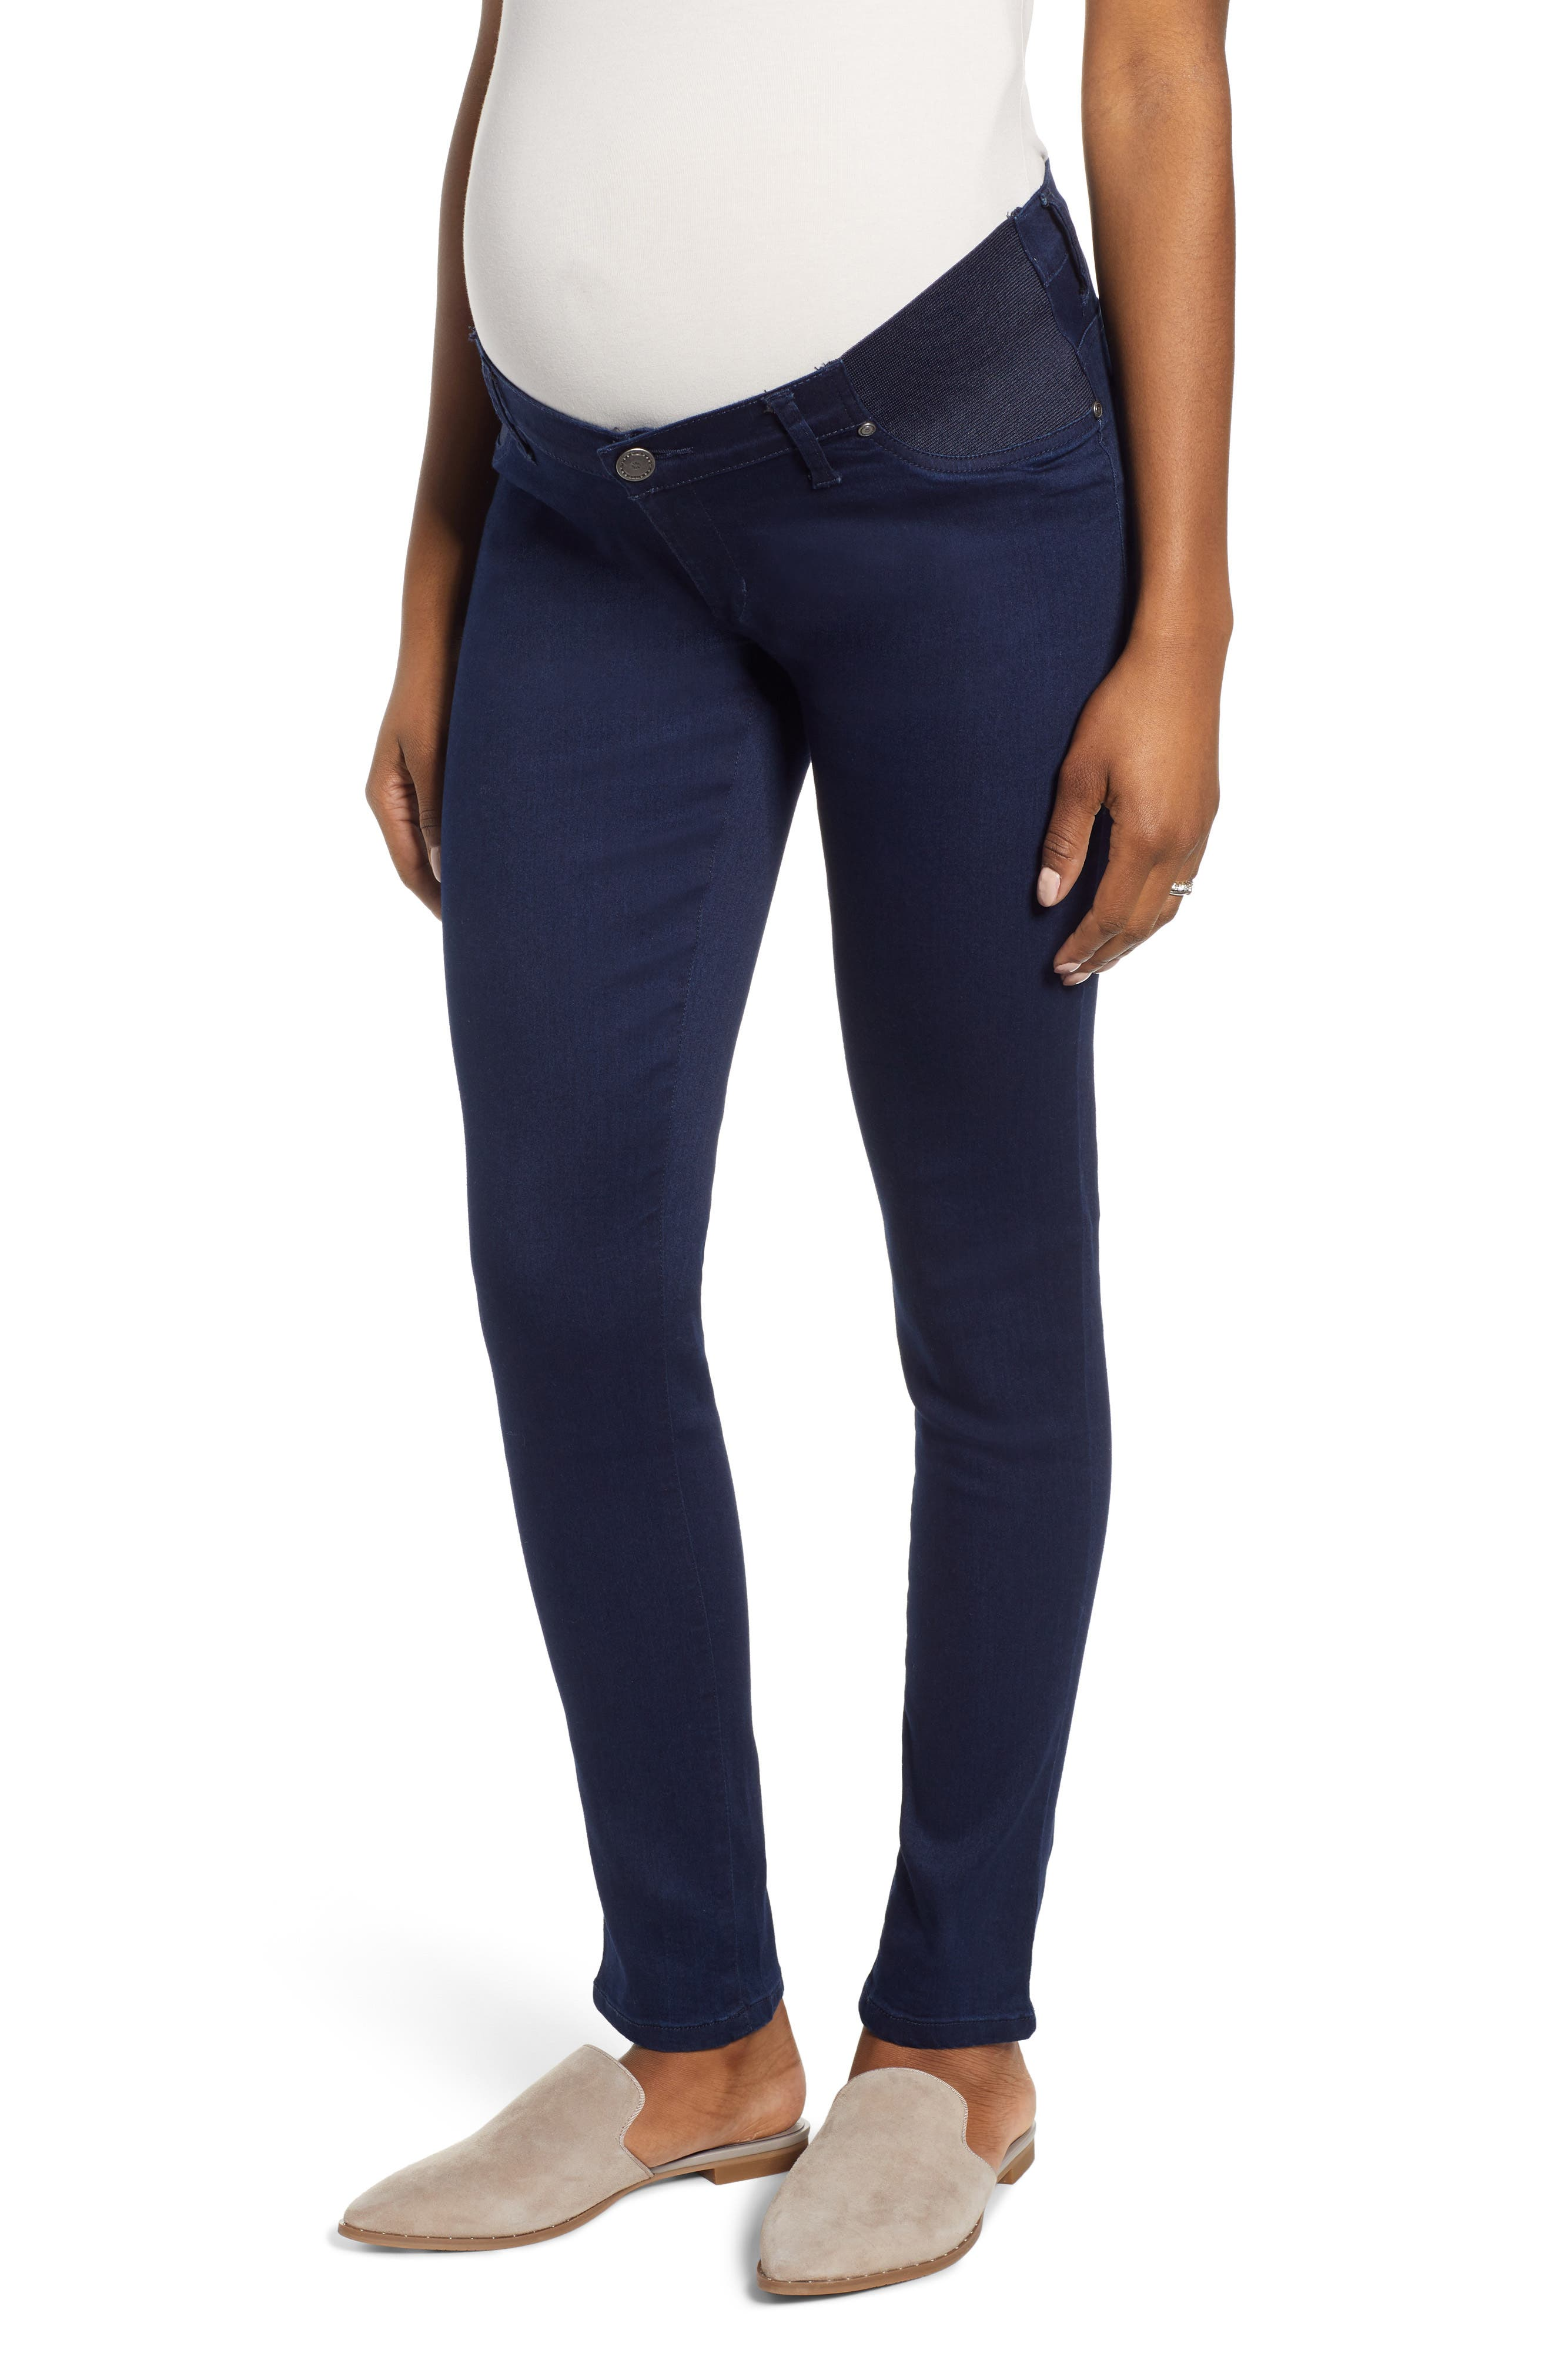 b96c0fa362388 Women's Angel Maternity Comfortable Stretch Maternity Jeans